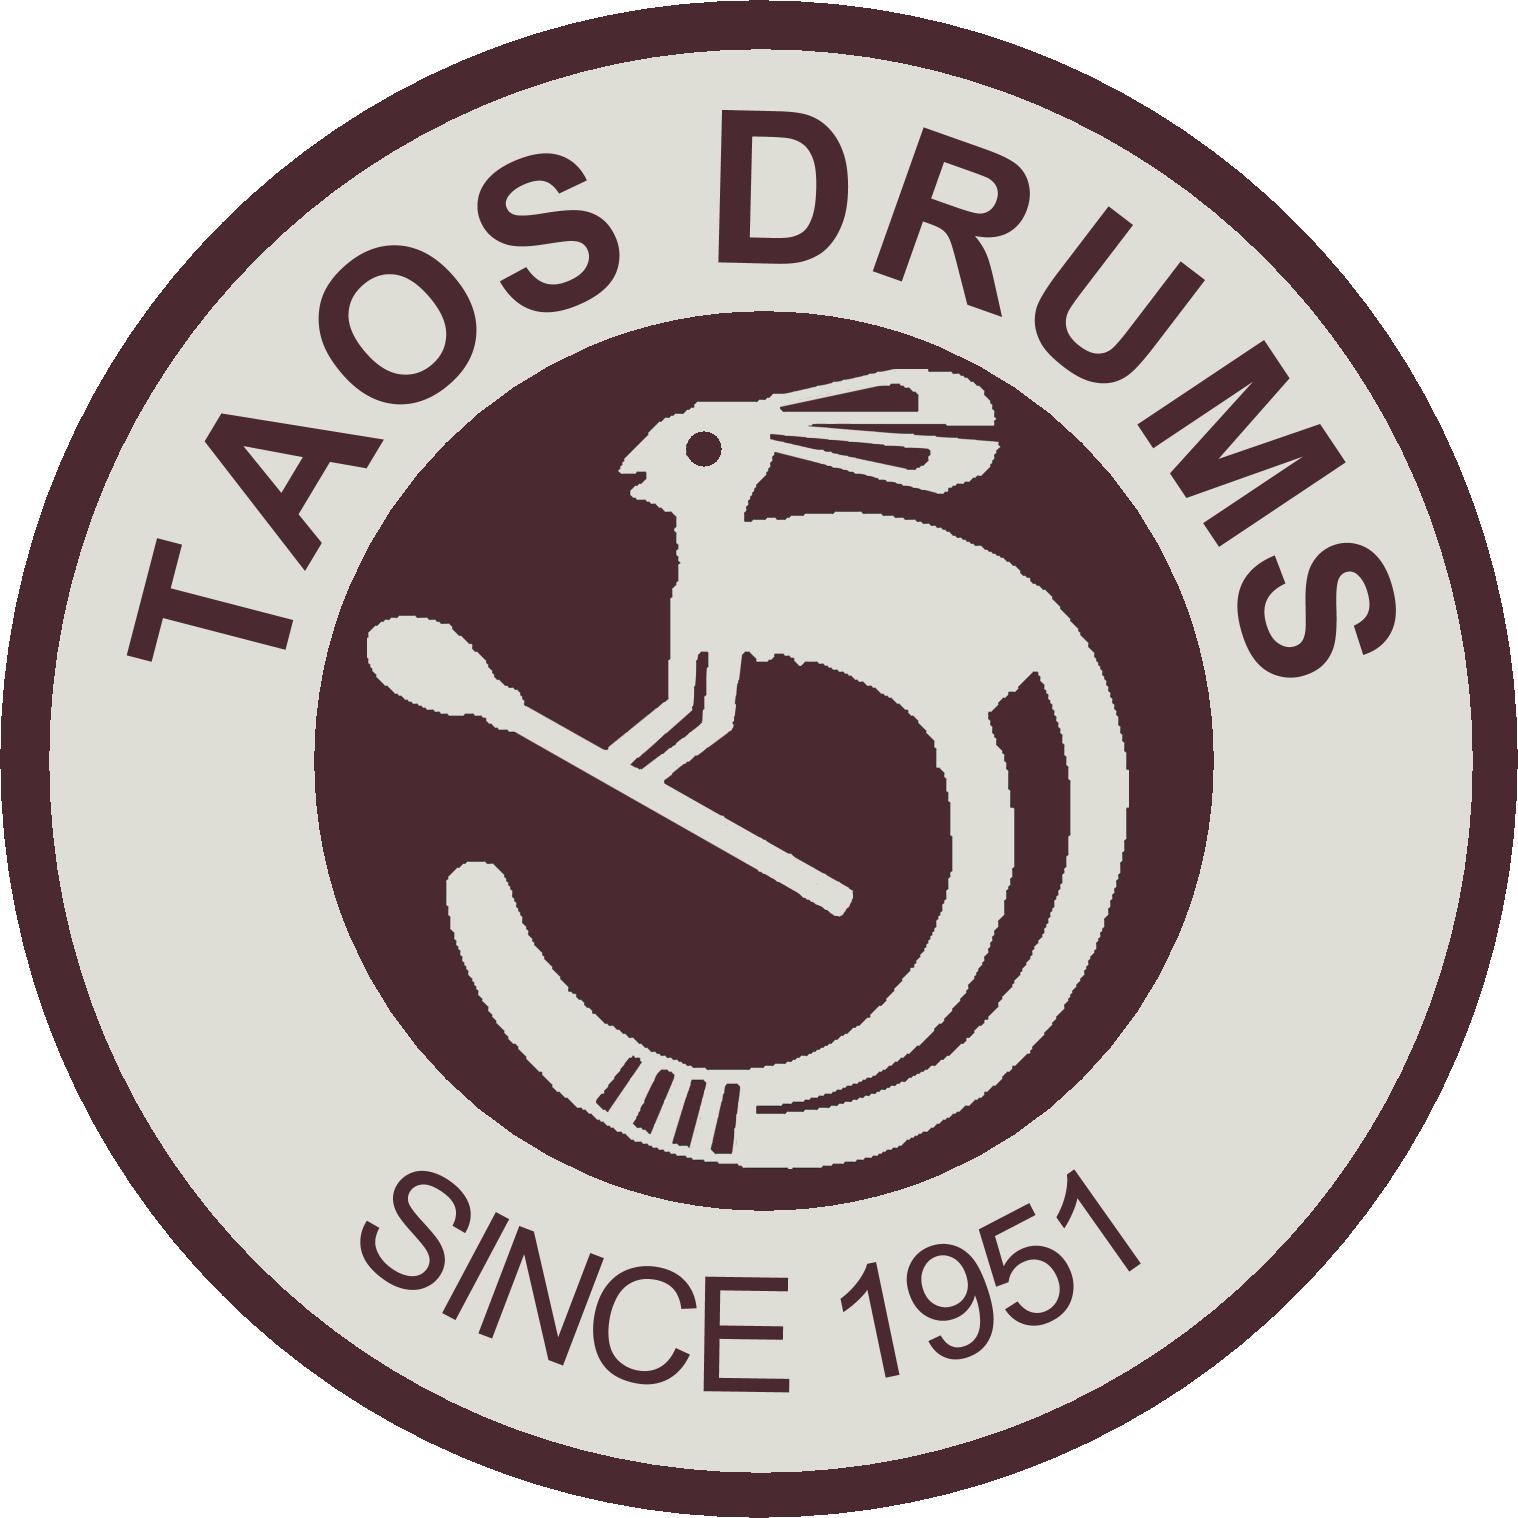 Taos Drums